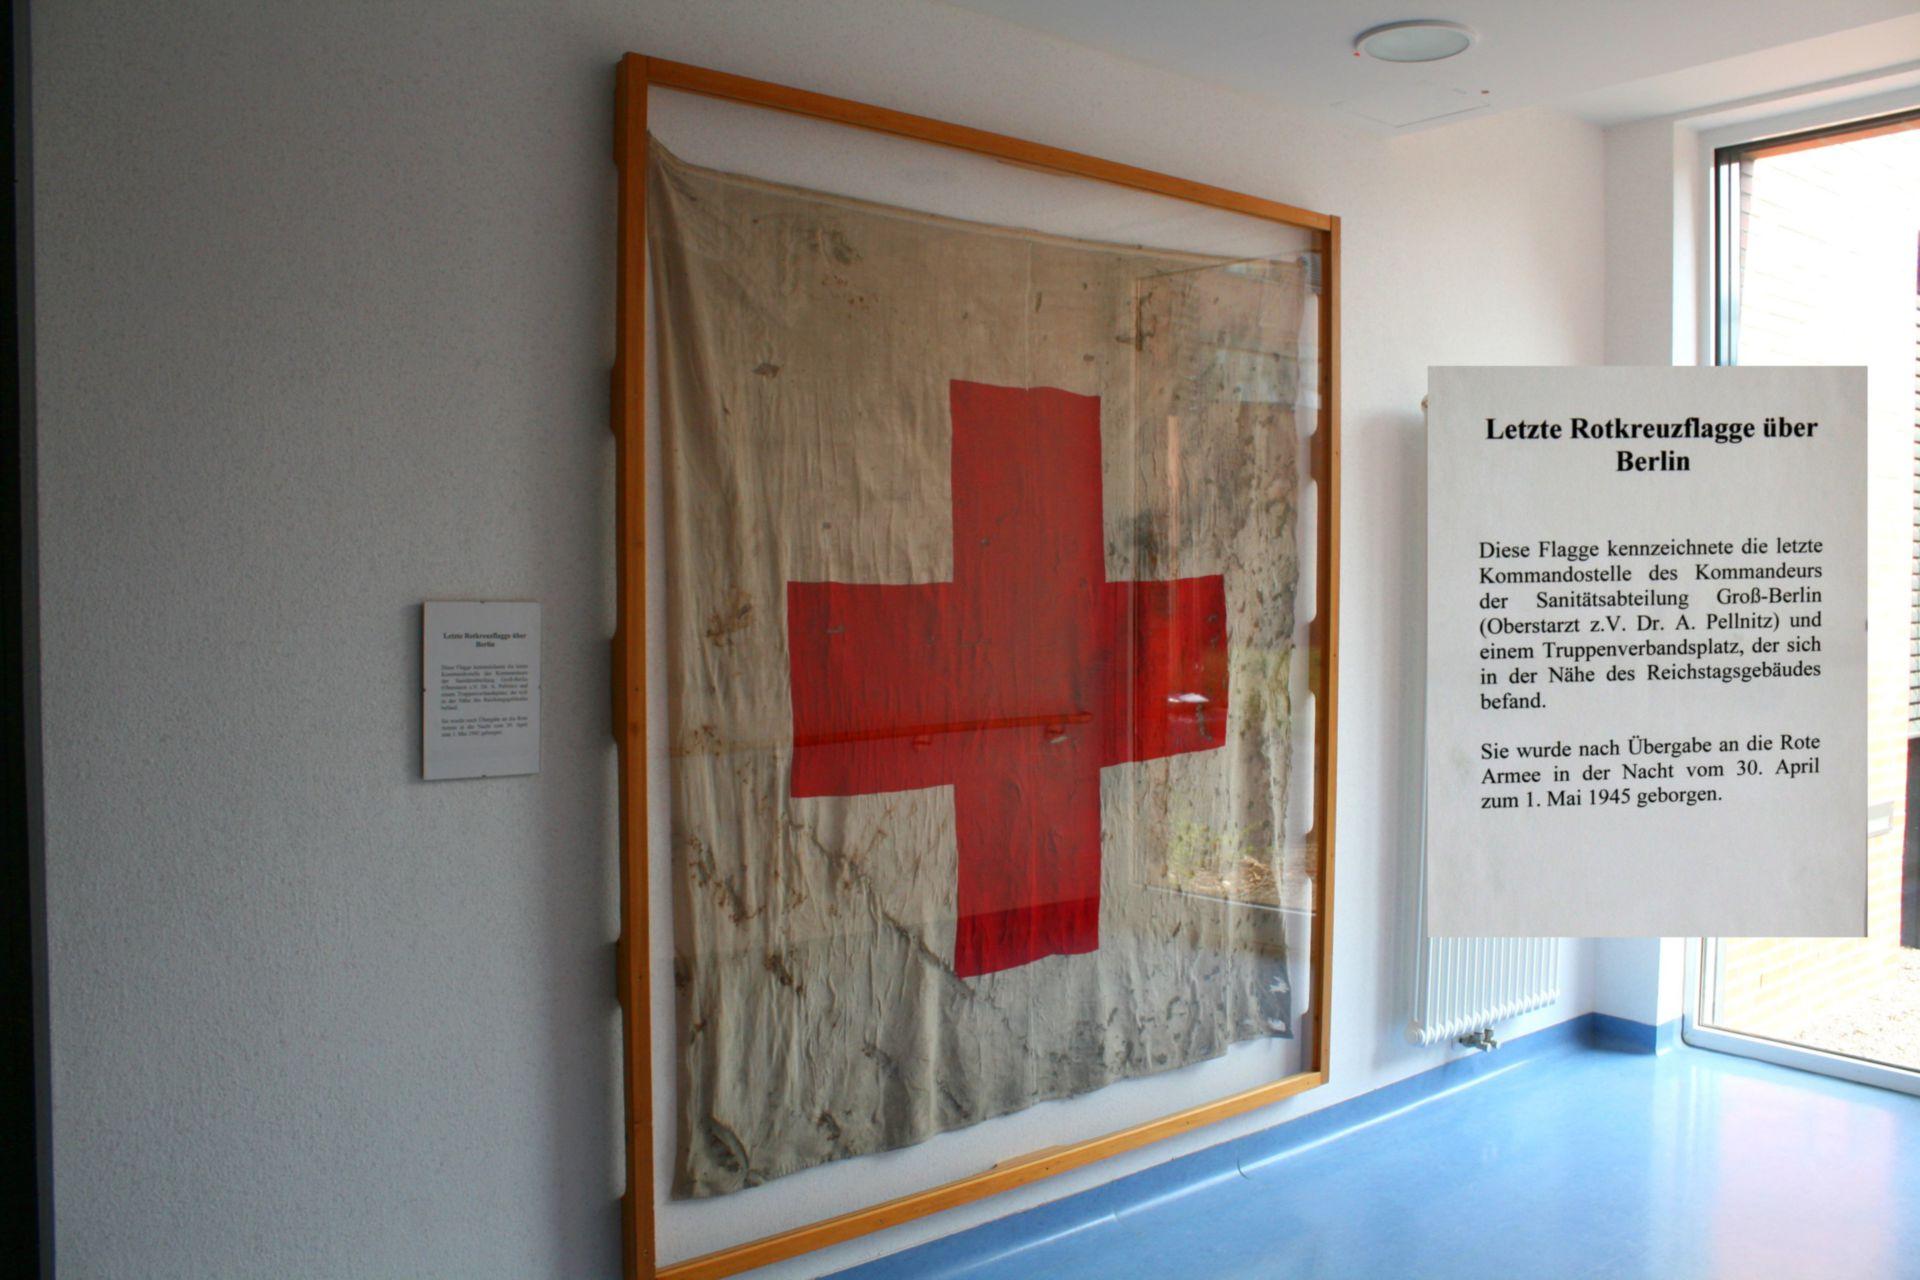 Last Red Cross flag over Berlin (1945)